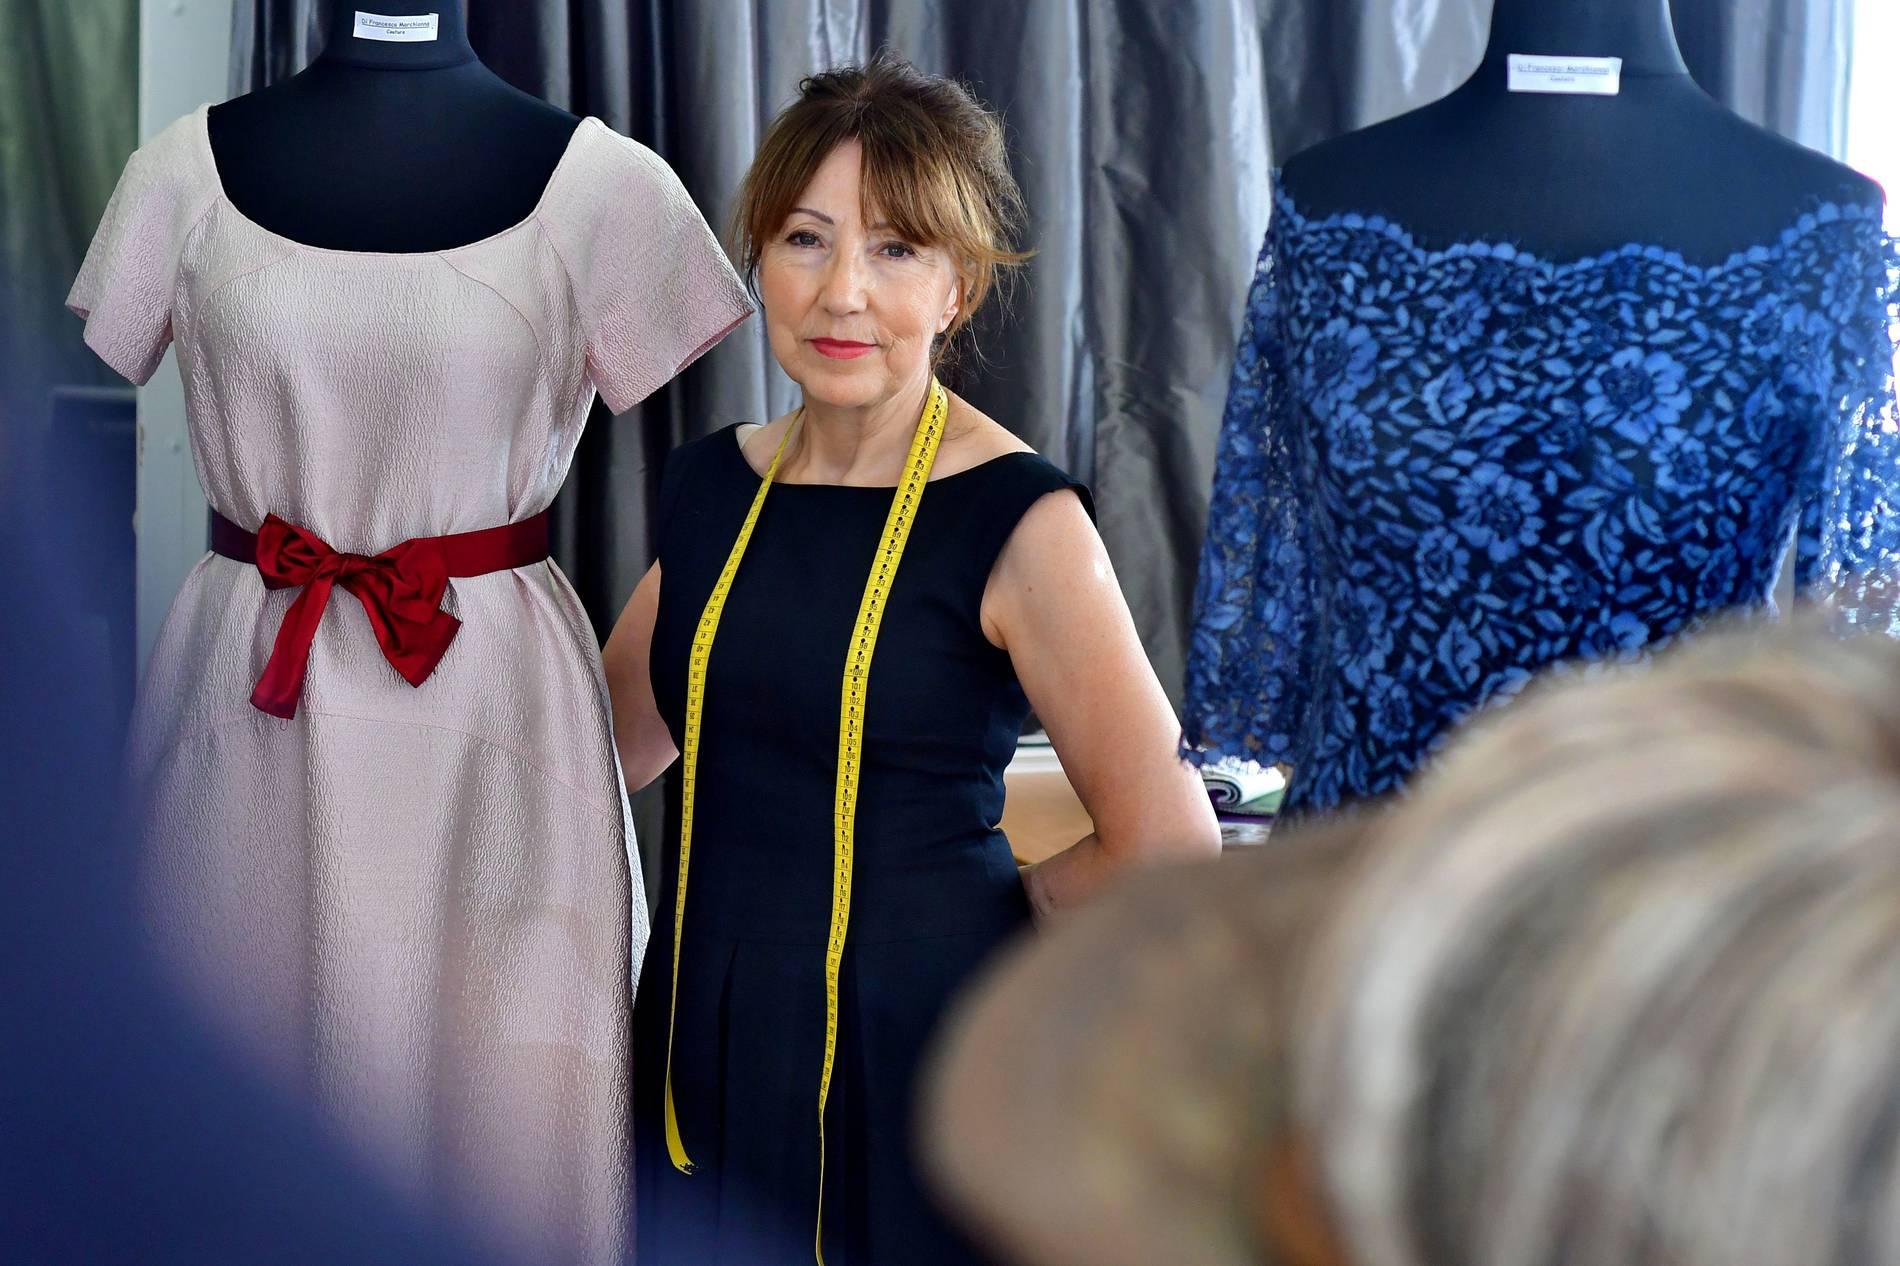 5e5ad08aaa Handwerk in Moers : Meisterin mit dem Blick für Mode